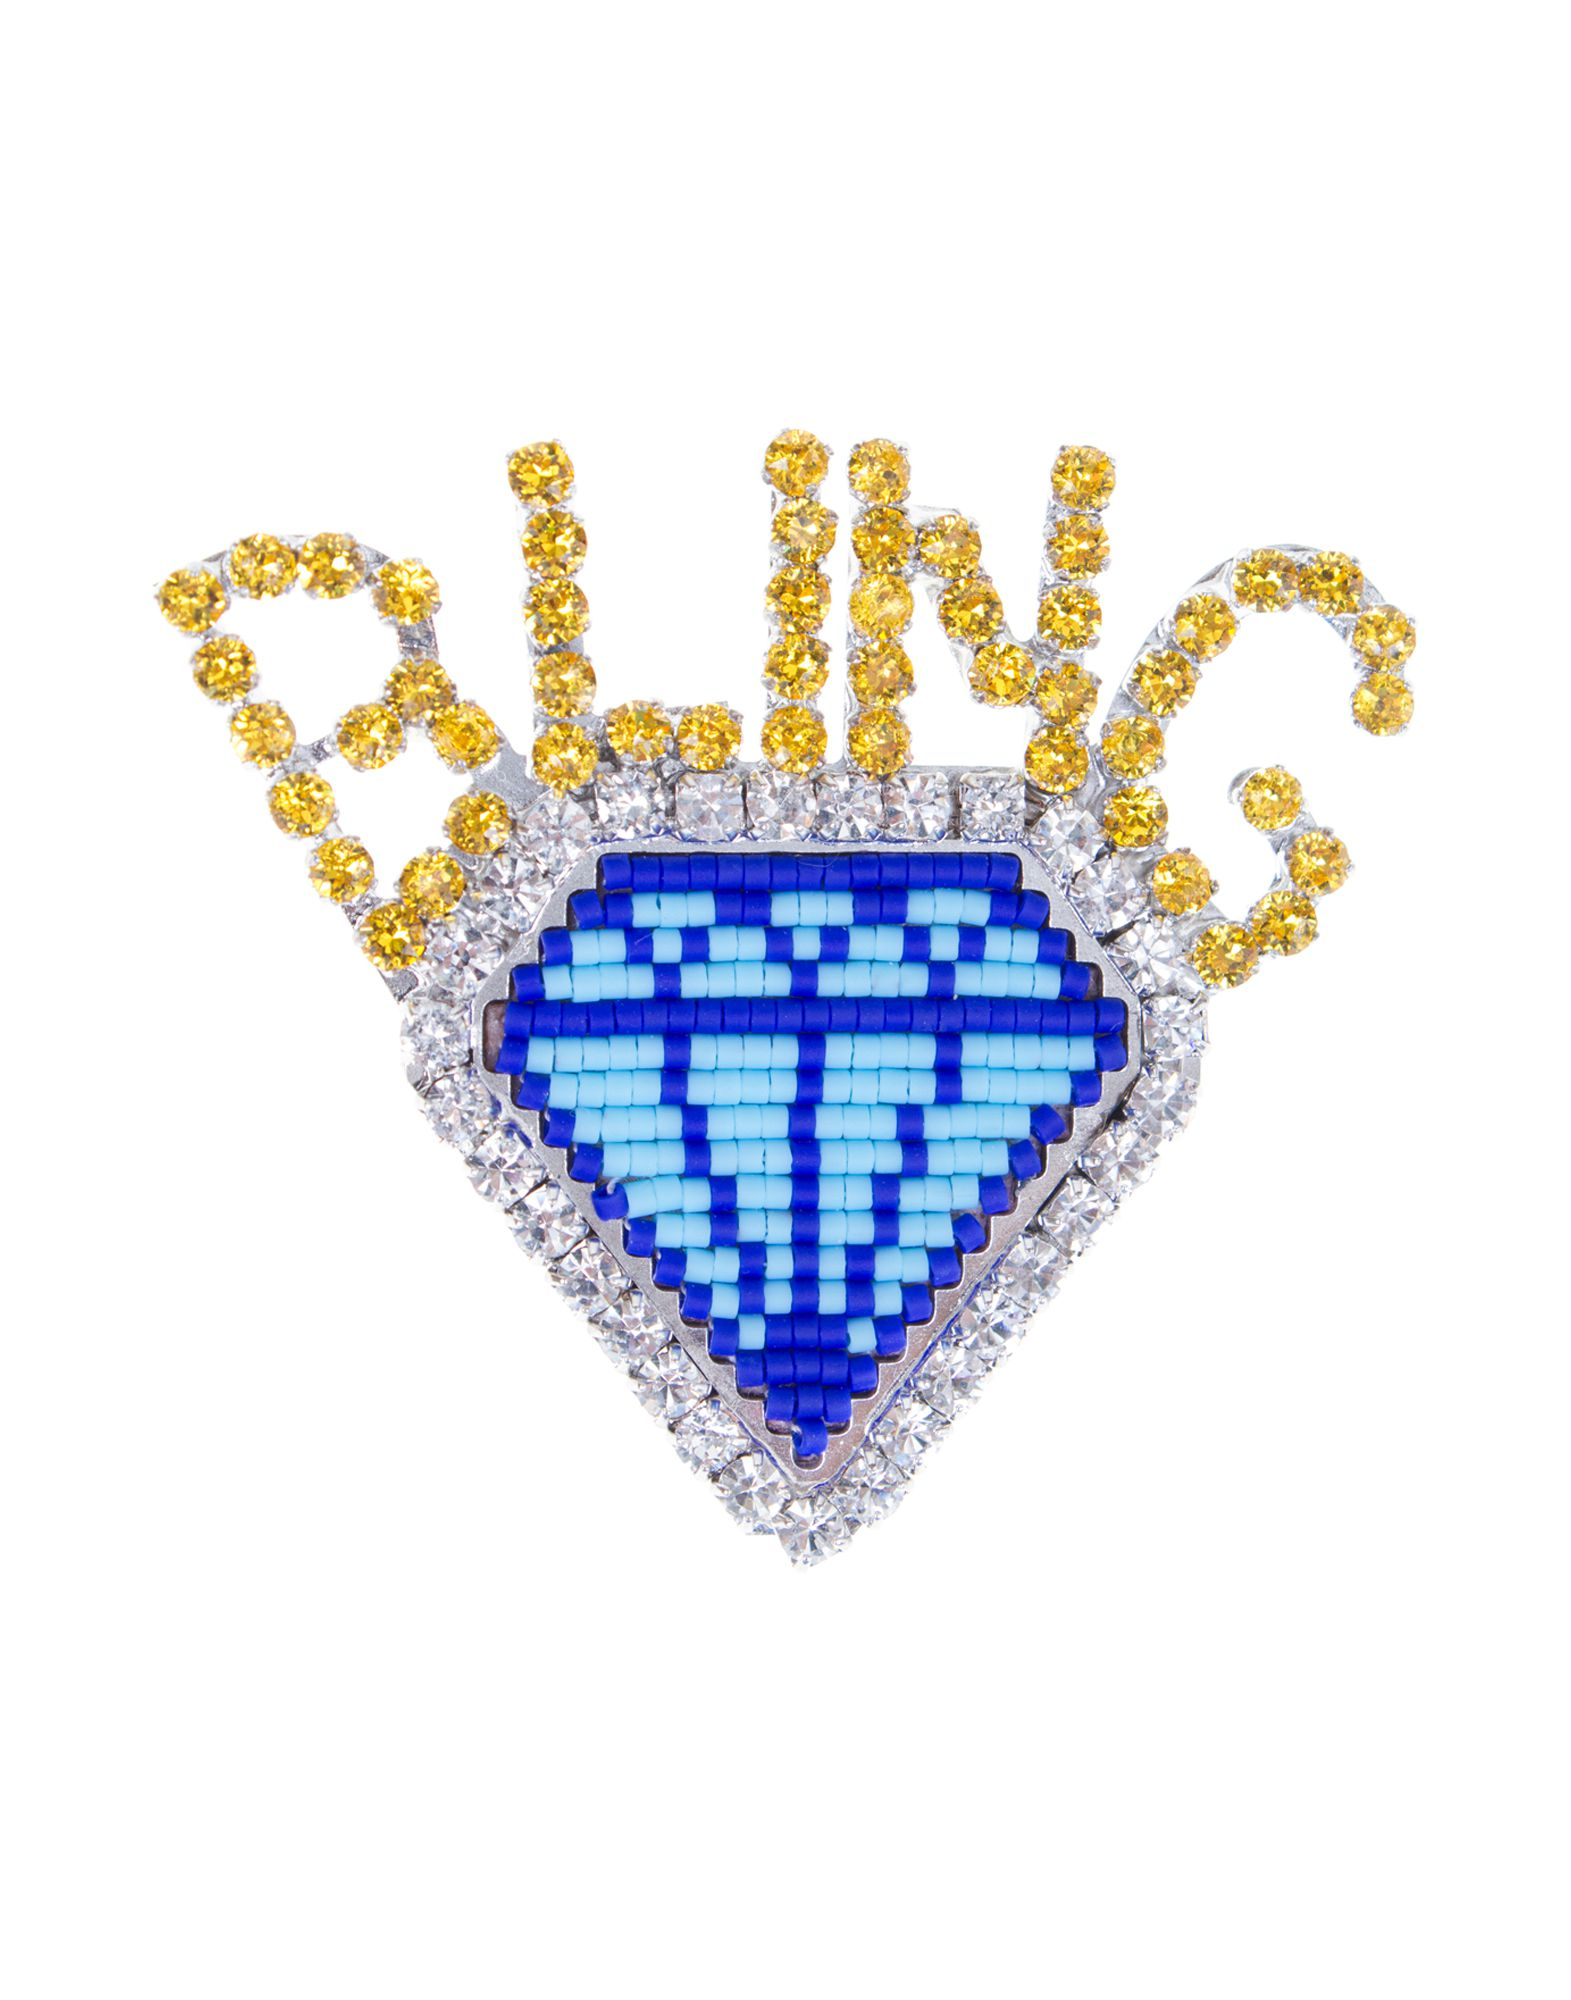 Spilla Shourouk Emojibling Diamond Brooch - Donna - Acquista online su